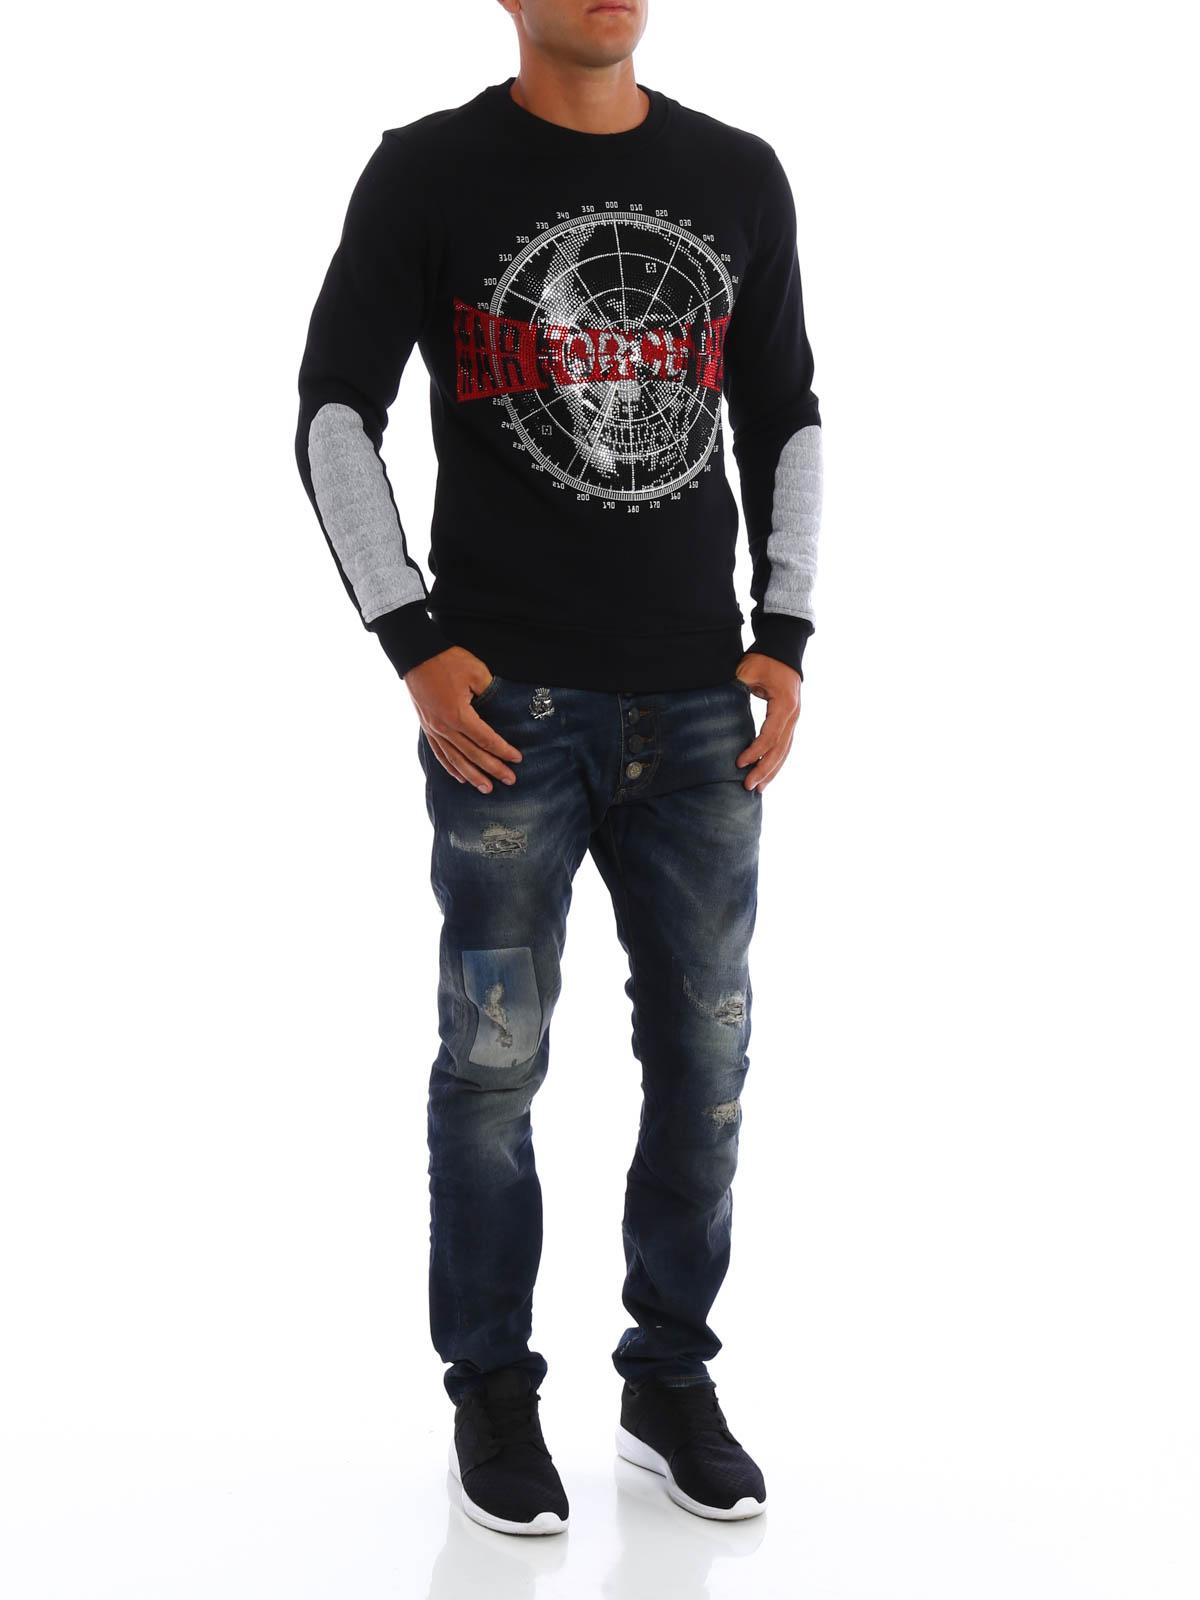 Pulls Sweatshirt amp; 02 Hm631094 Deerfield Plein Sweatshirts Philipp qfpOzXUwq